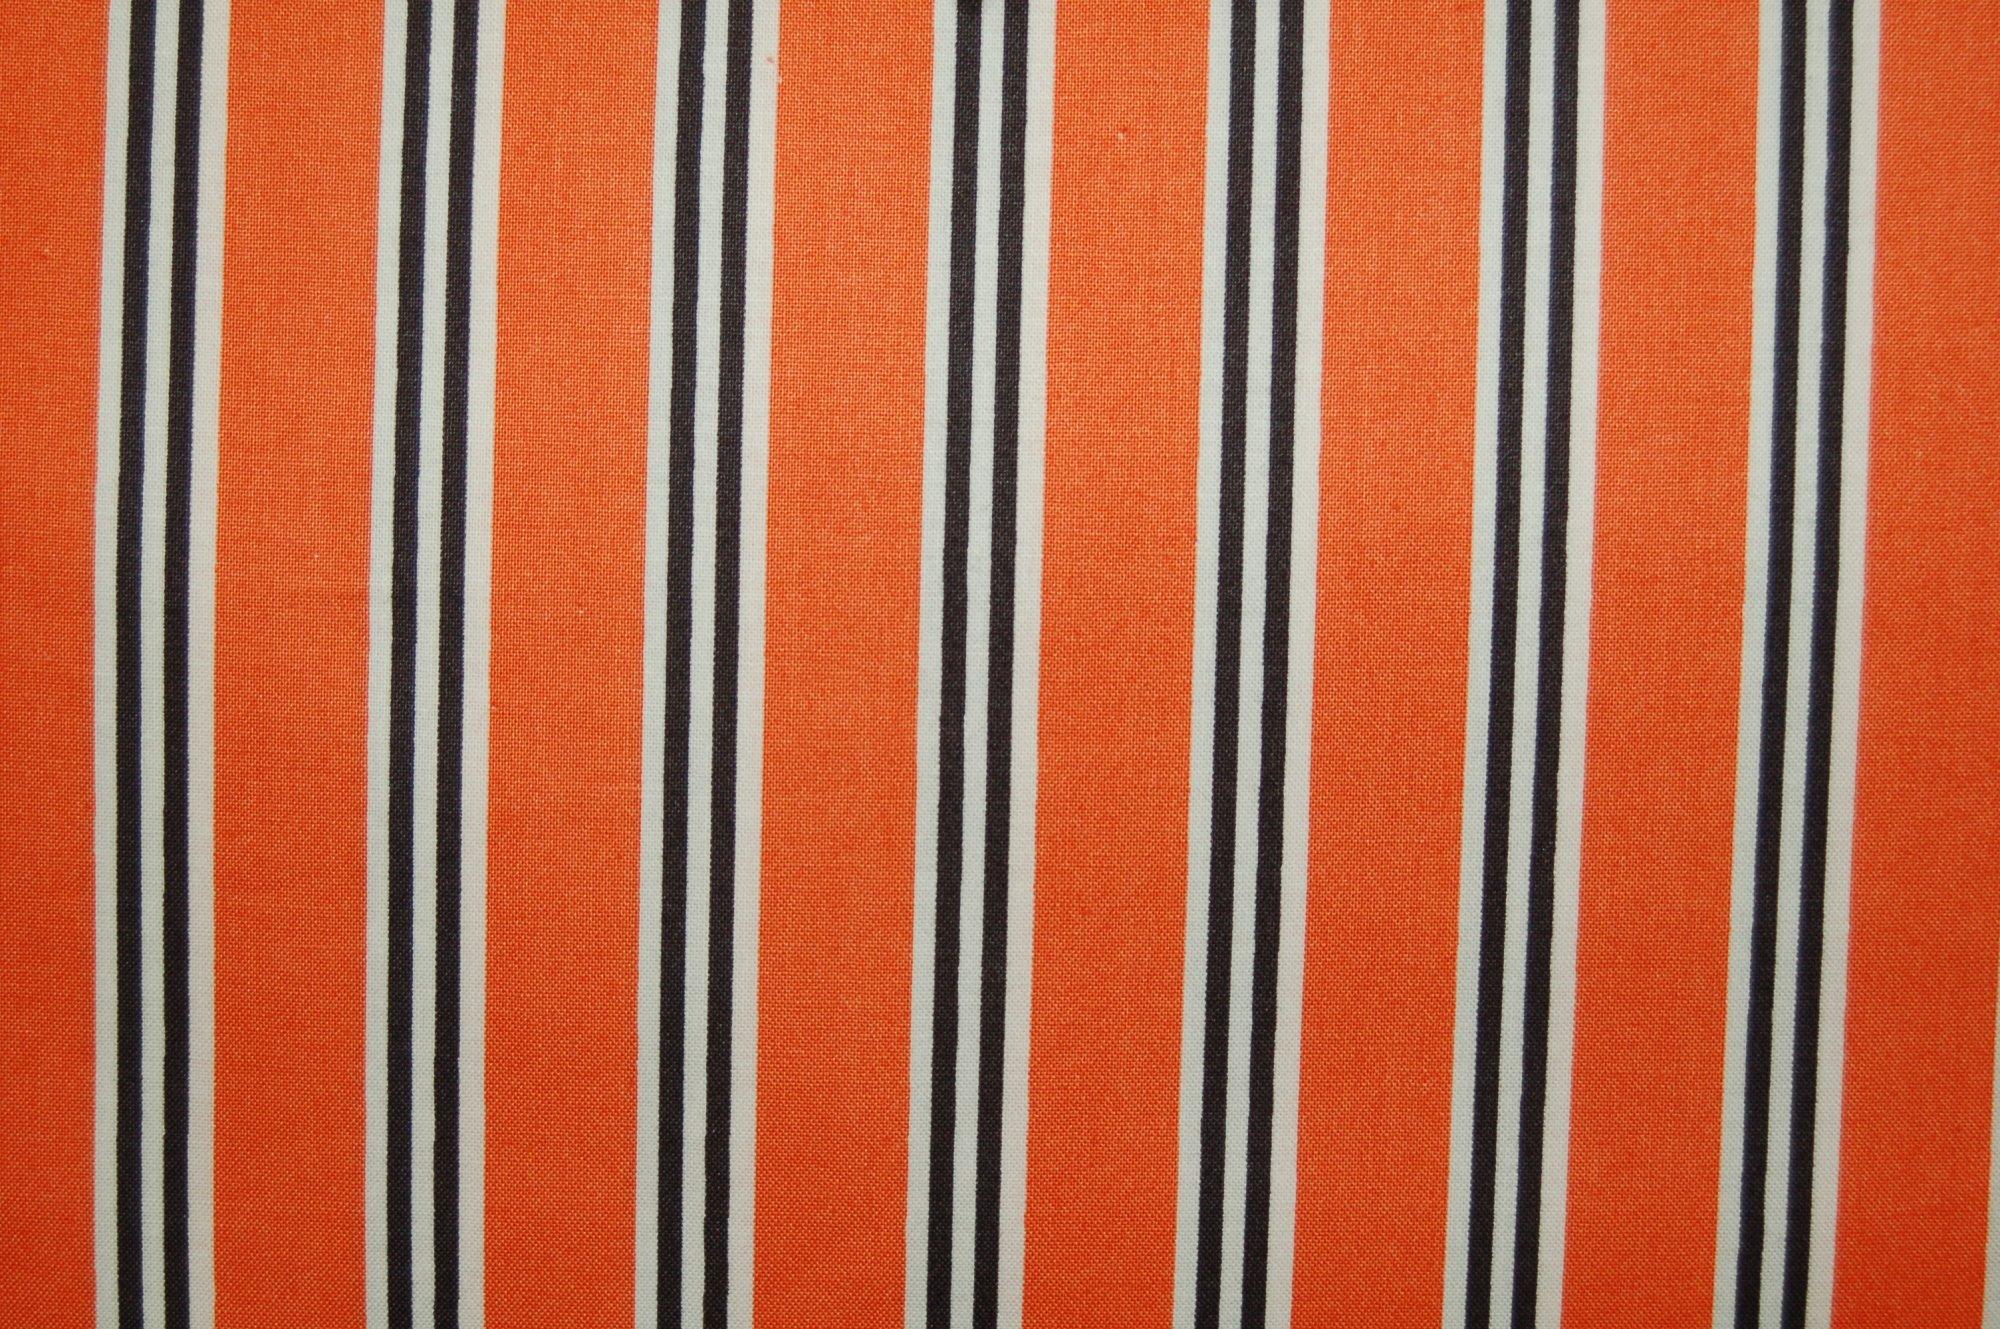 Candelabra - Candy Stripe (Orange) from Verna Mosquera for Free Spirit Designs